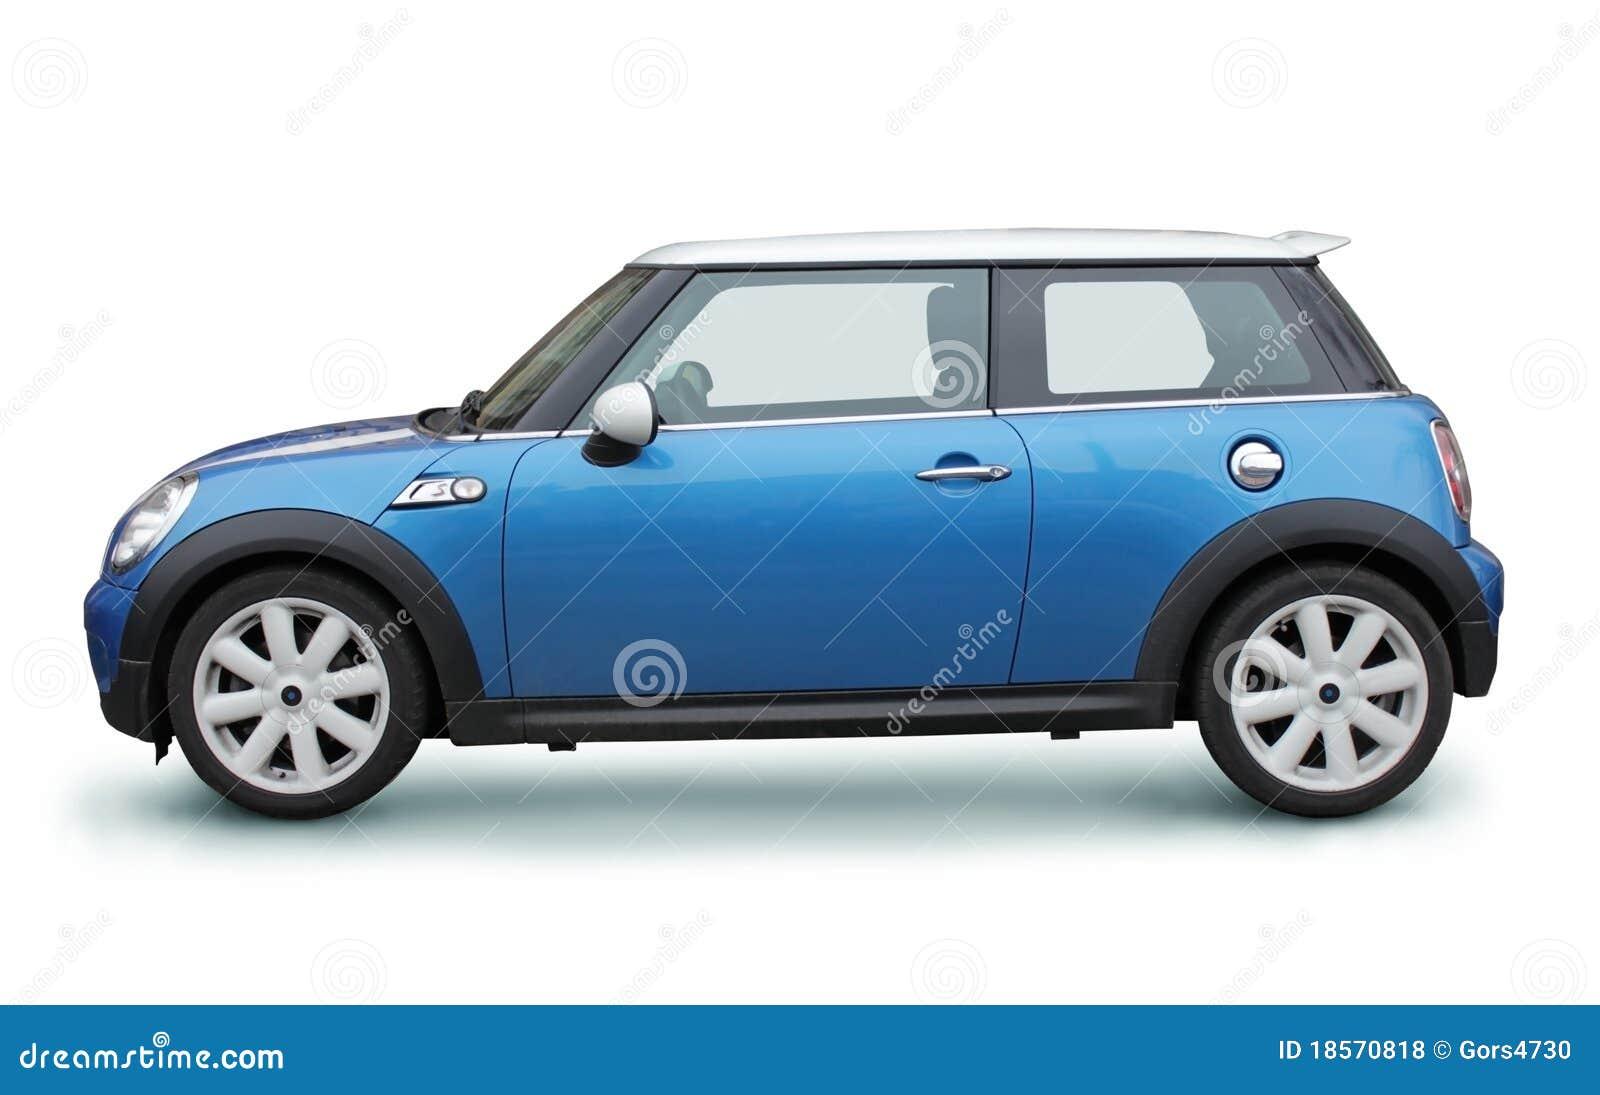 Small Blue Car Royalty Free Stock Photos Image 18570818